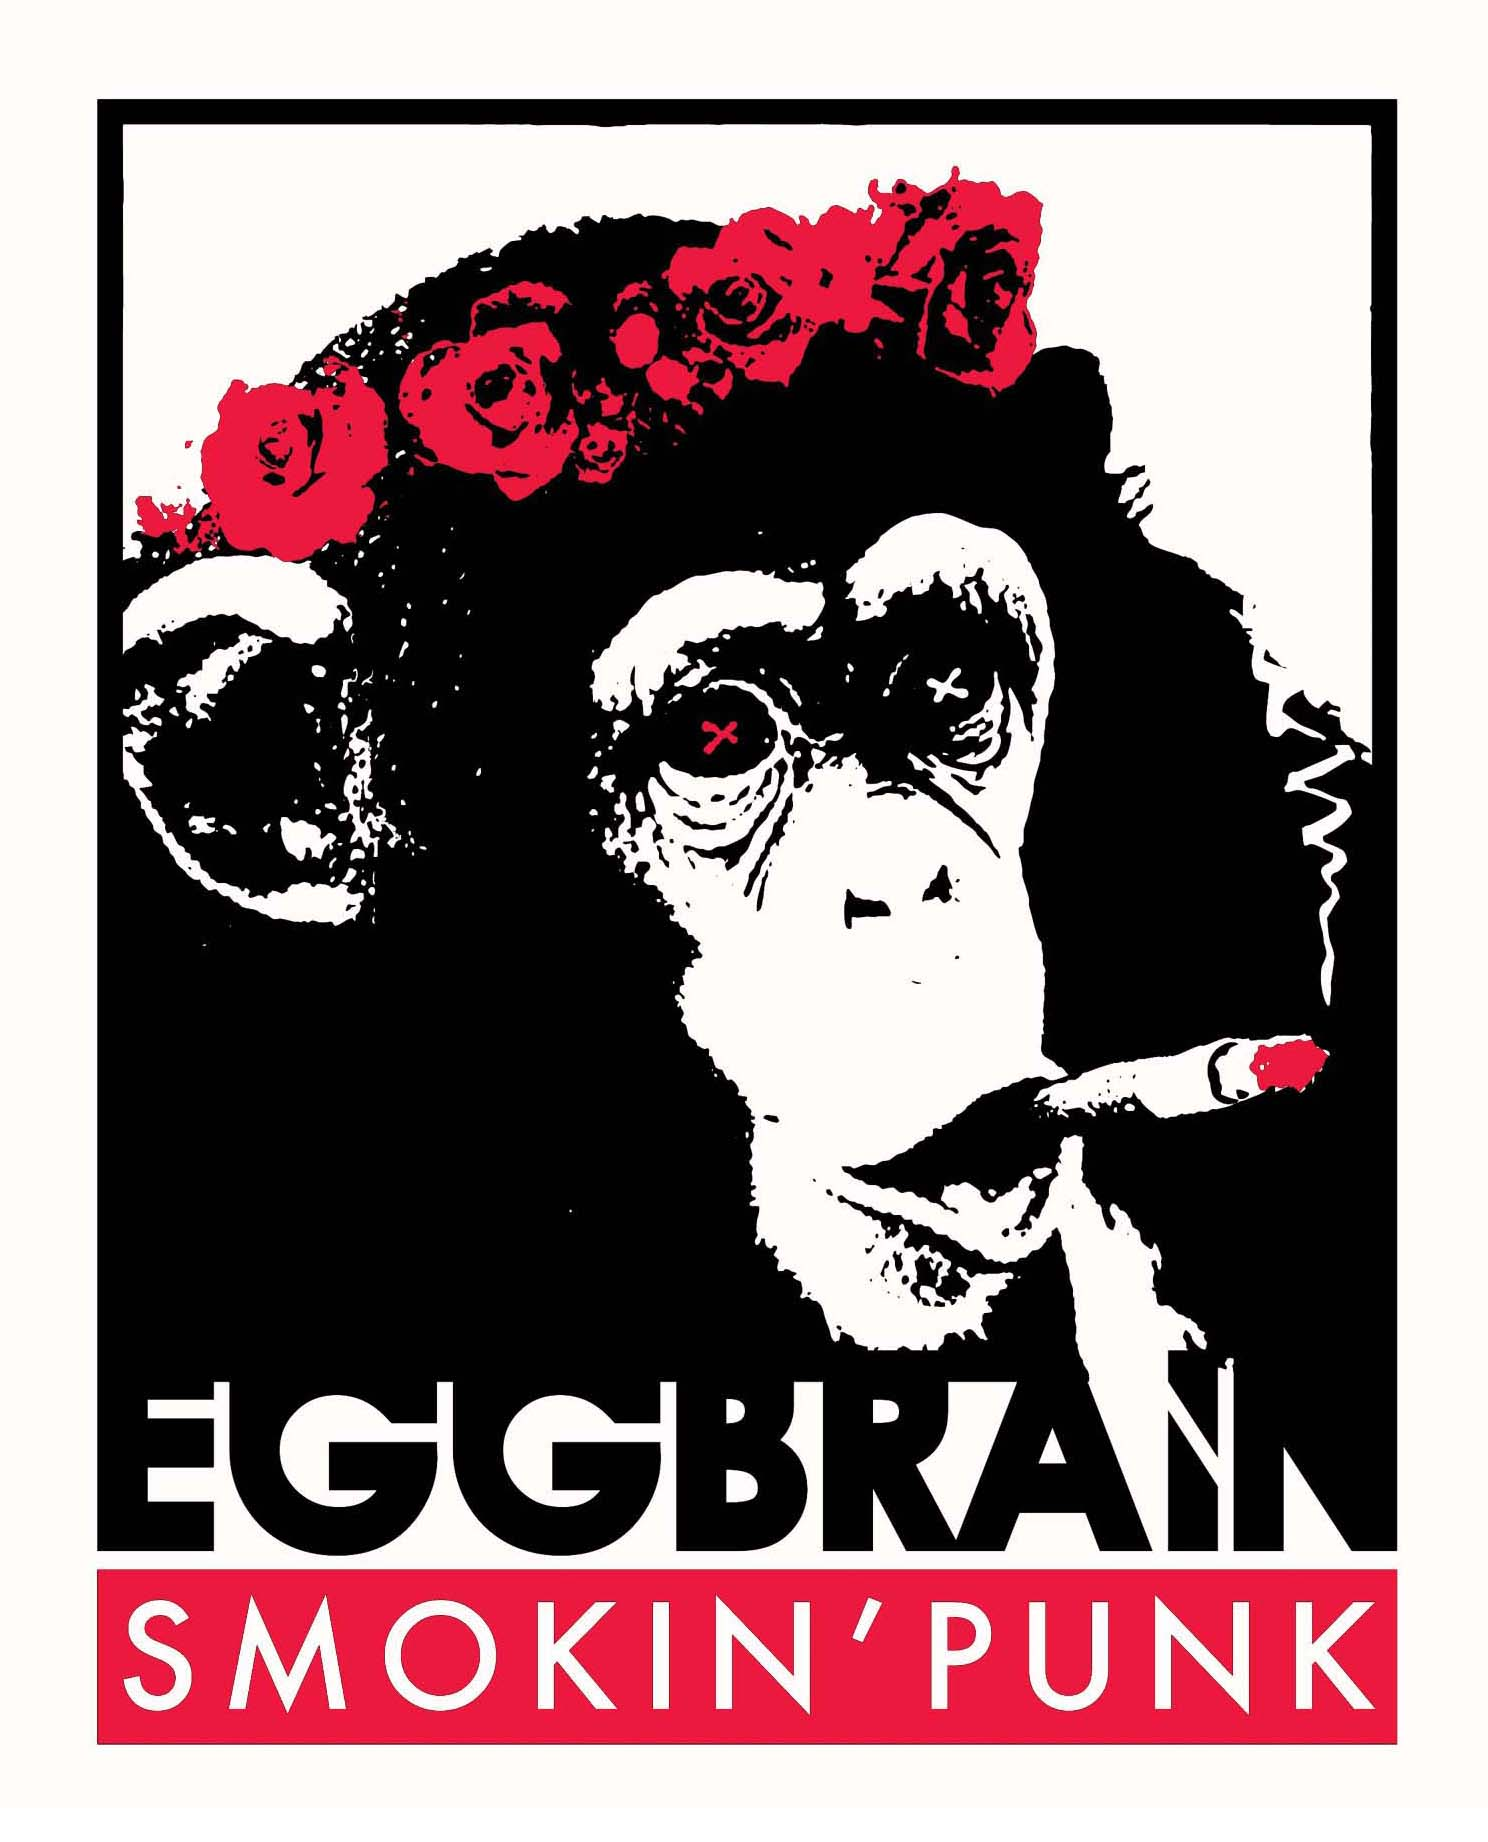 EGGBRAIN / SMOKIN'PUNK